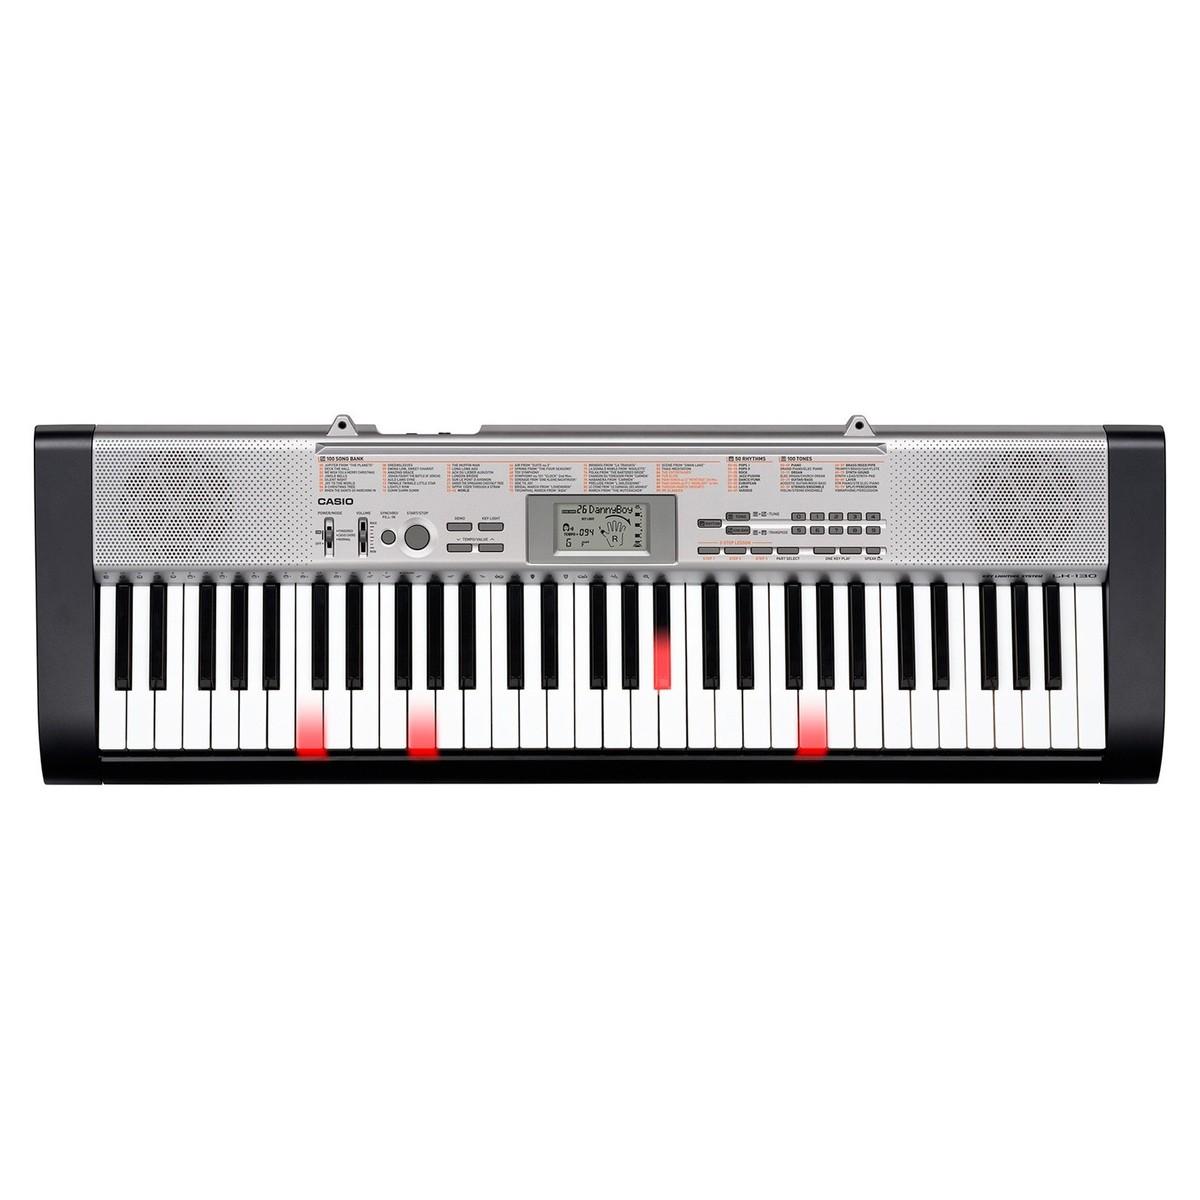 disc casio lk 130 keylighting keyboard at gear4music. Black Bedroom Furniture Sets. Home Design Ideas